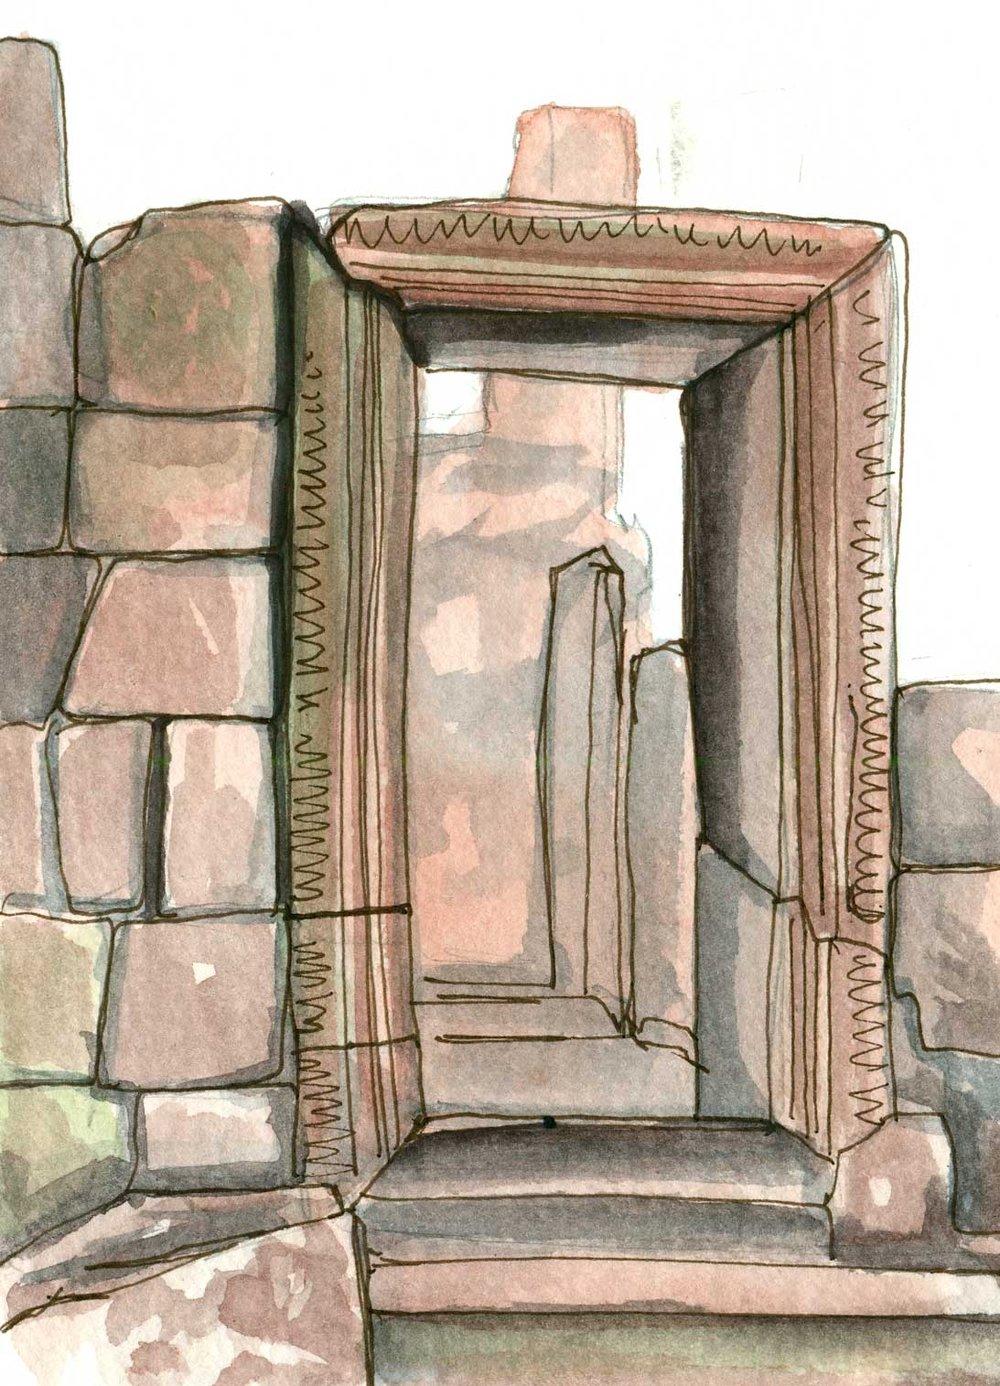 Sketch of a doorway using one panel in the accordion sketchbook